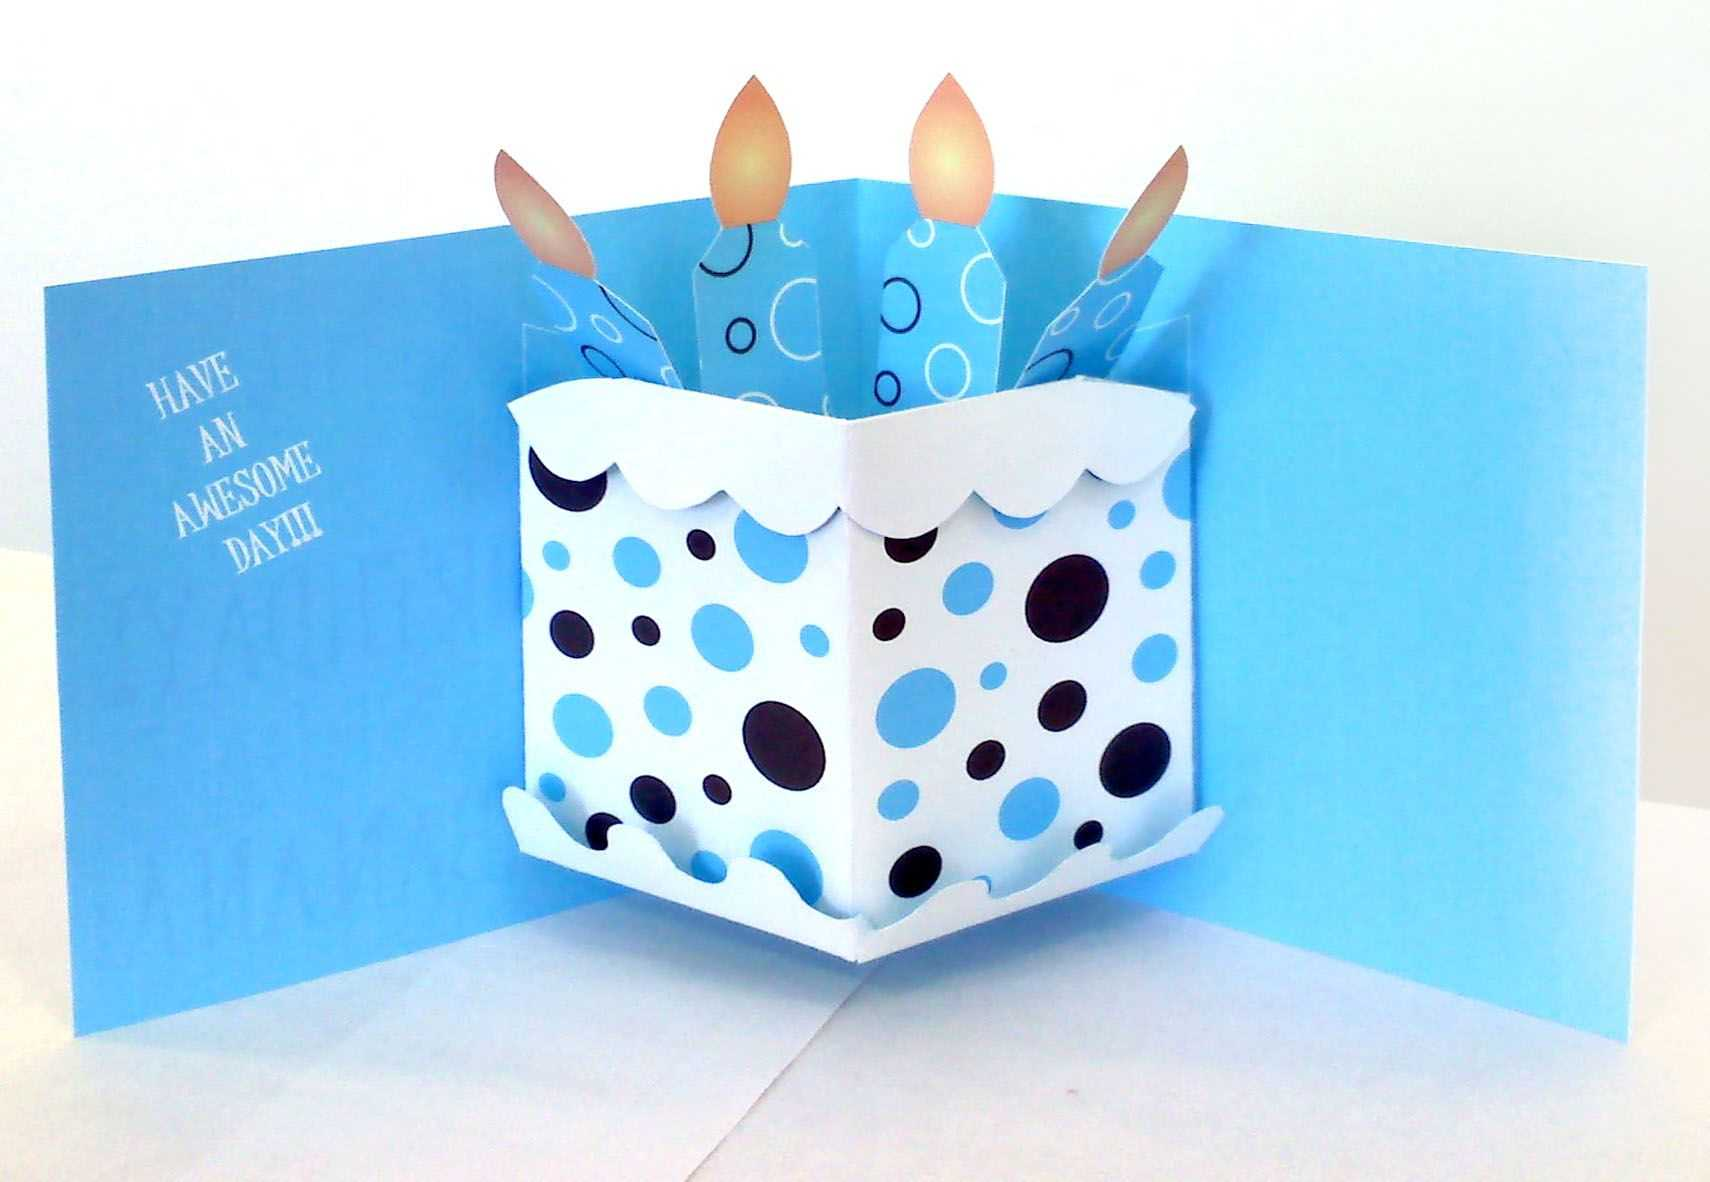 Pop Up Birthday Card | Pop Up Card Templates, Birthday Card within Pop Up Card Templates Free Printable